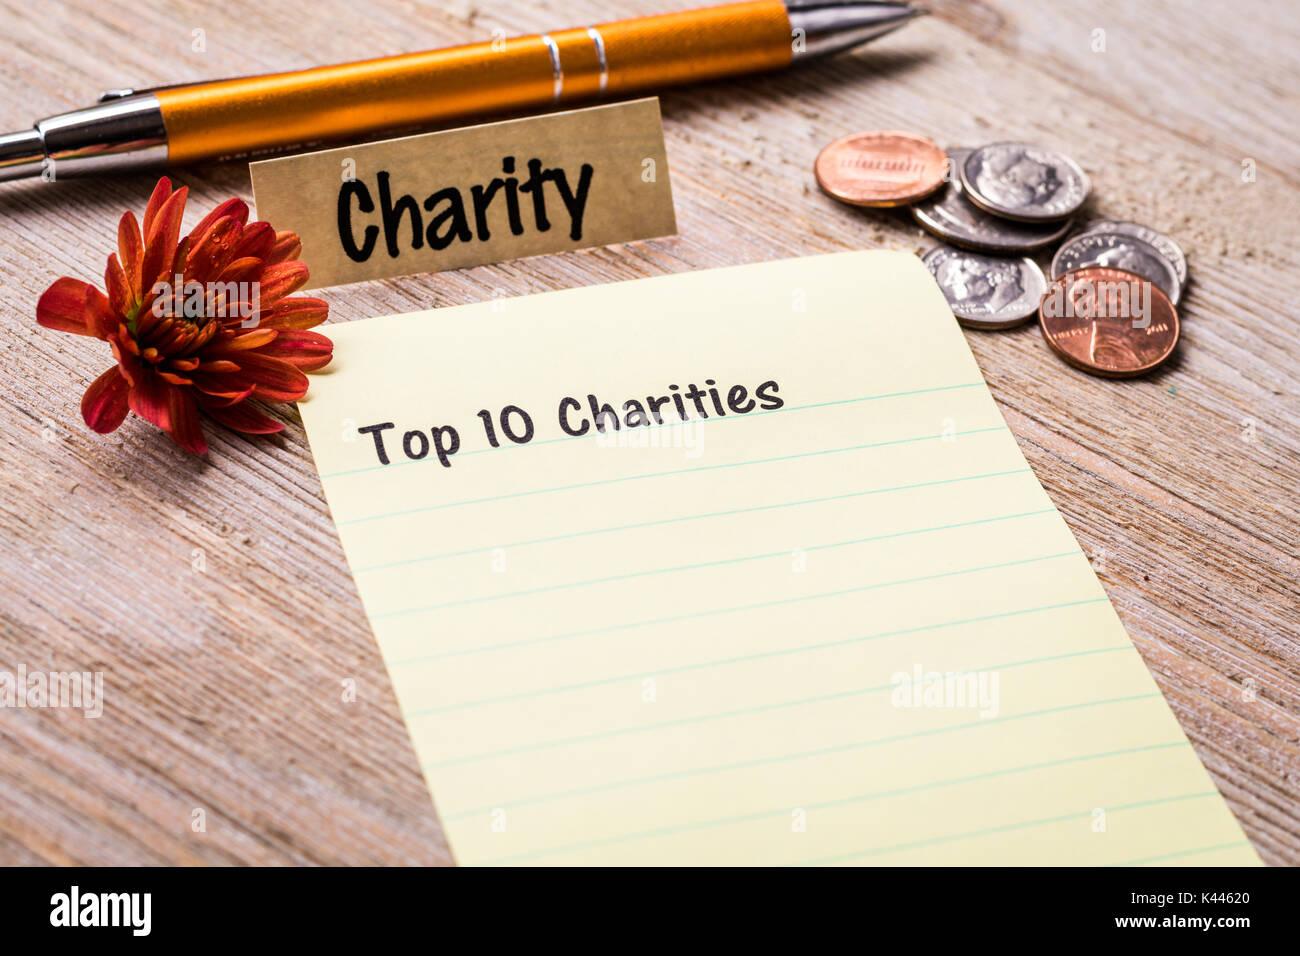 Clothing Donation Charity Stock Photos Clothing Donation Charity